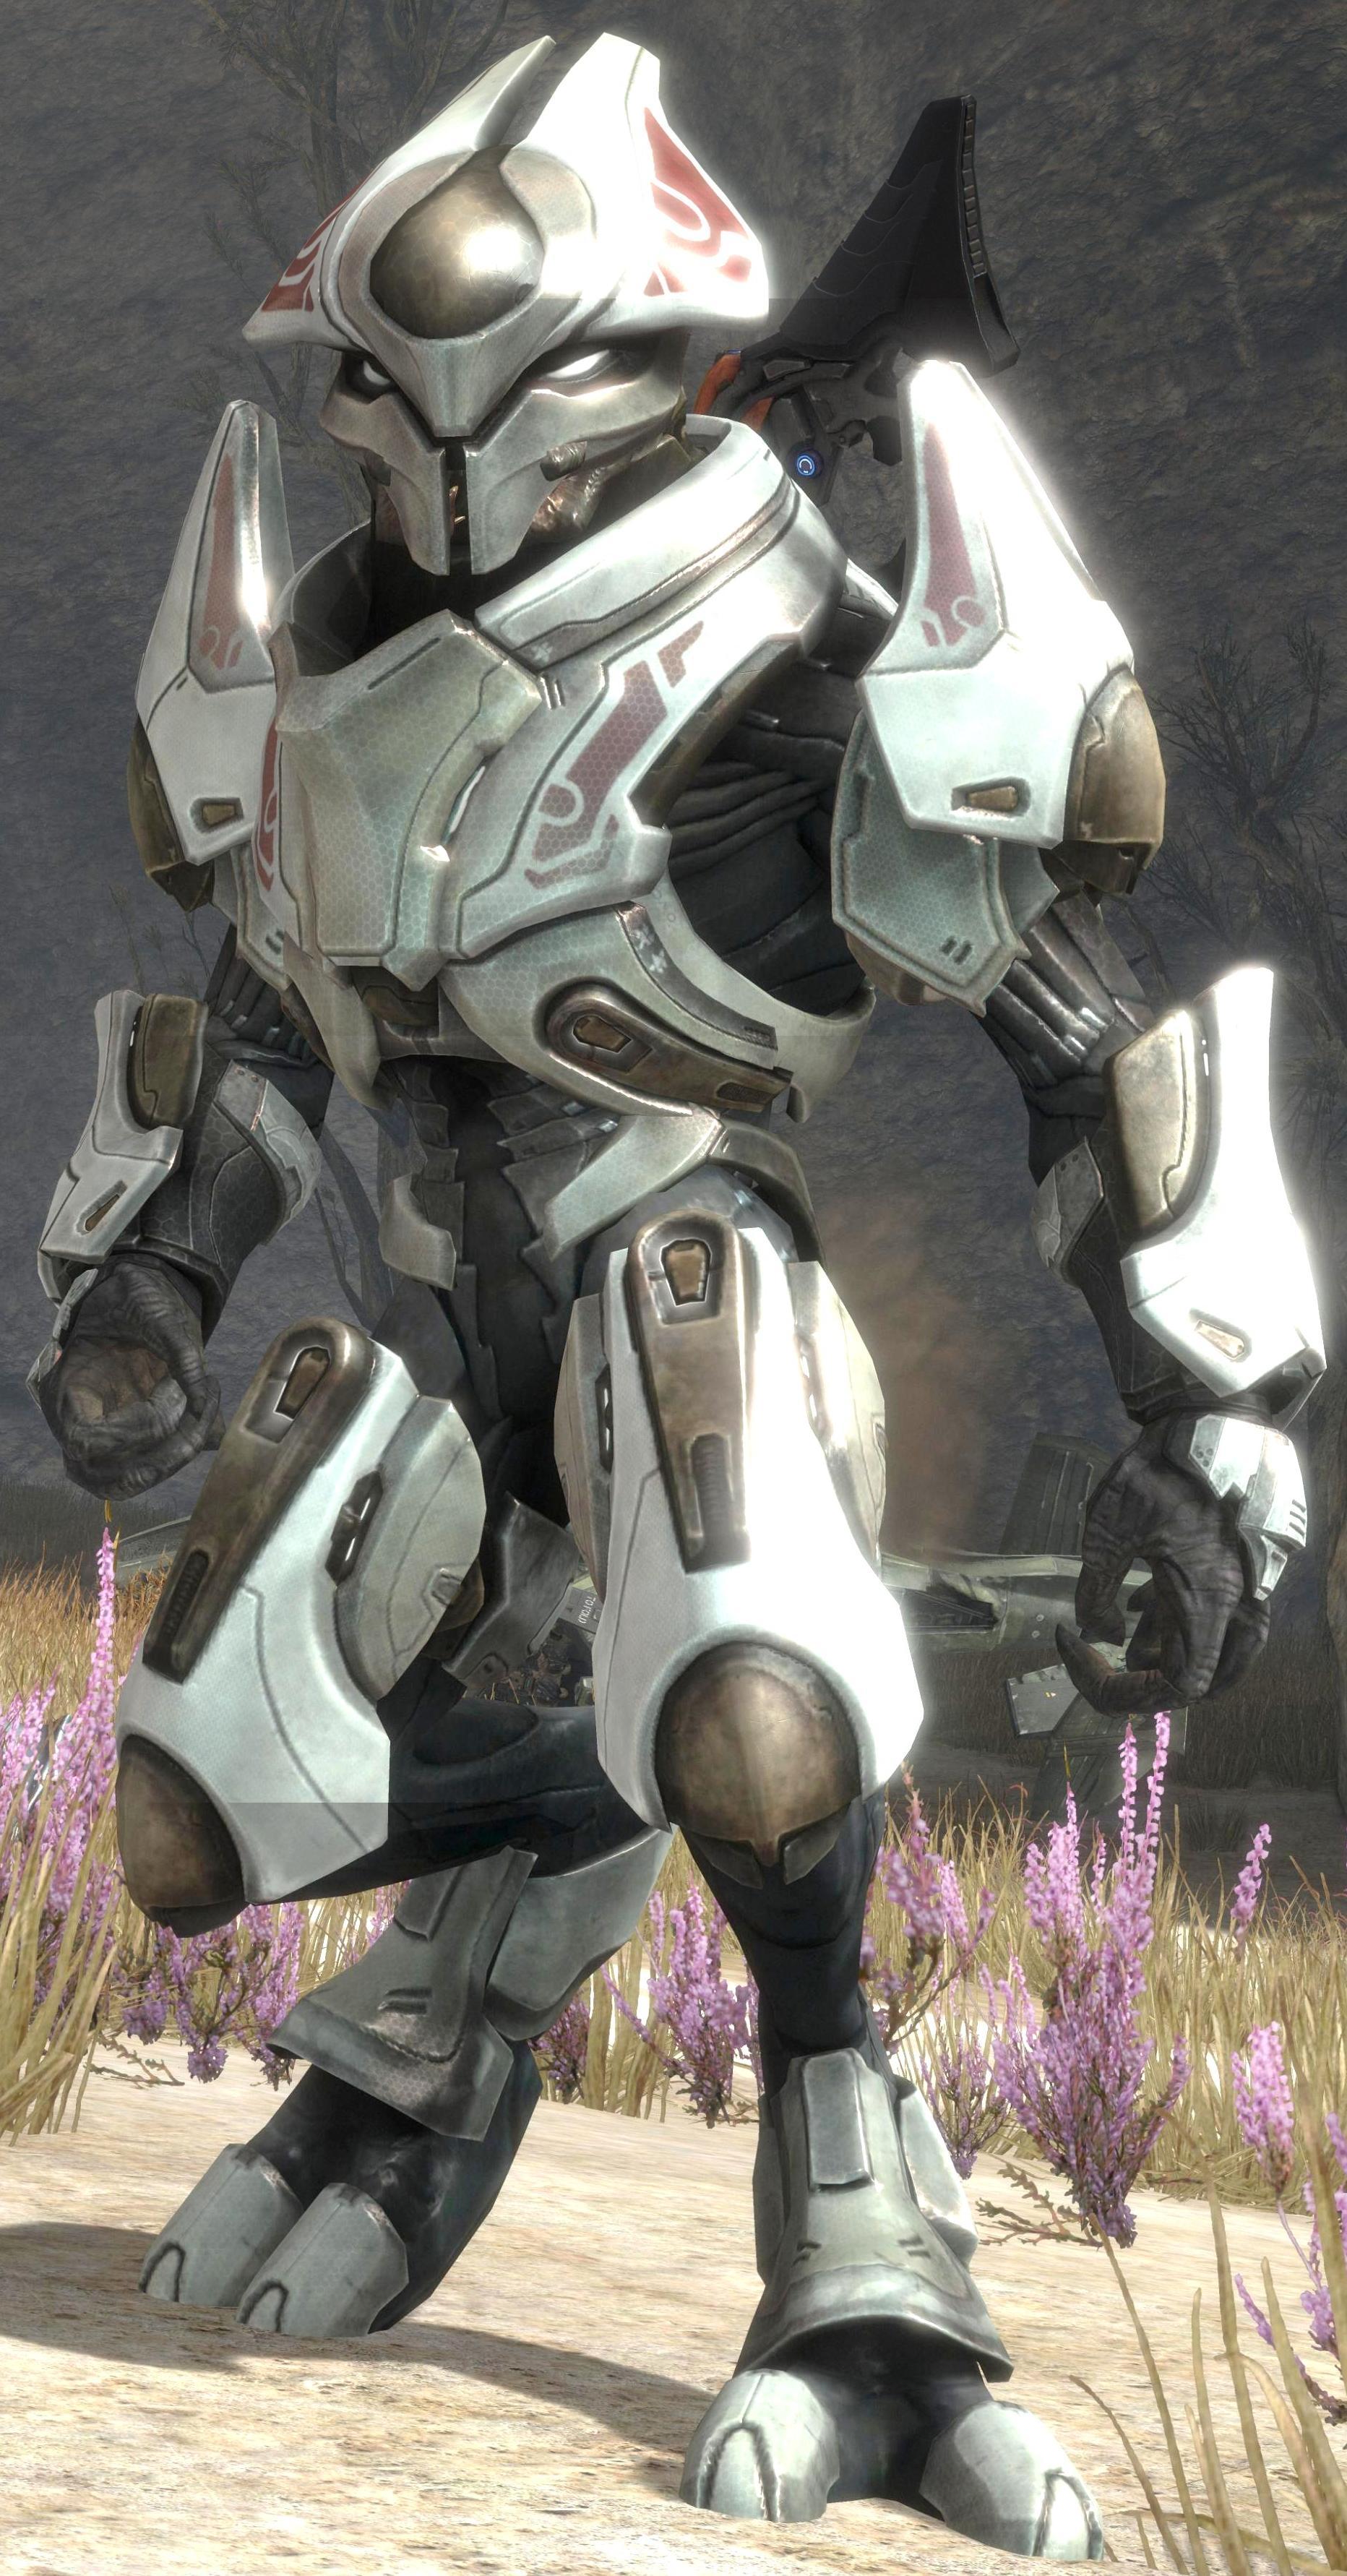 Sangheili (Elites) In New Trilogy Matchmaking   Halo 5: Guardians